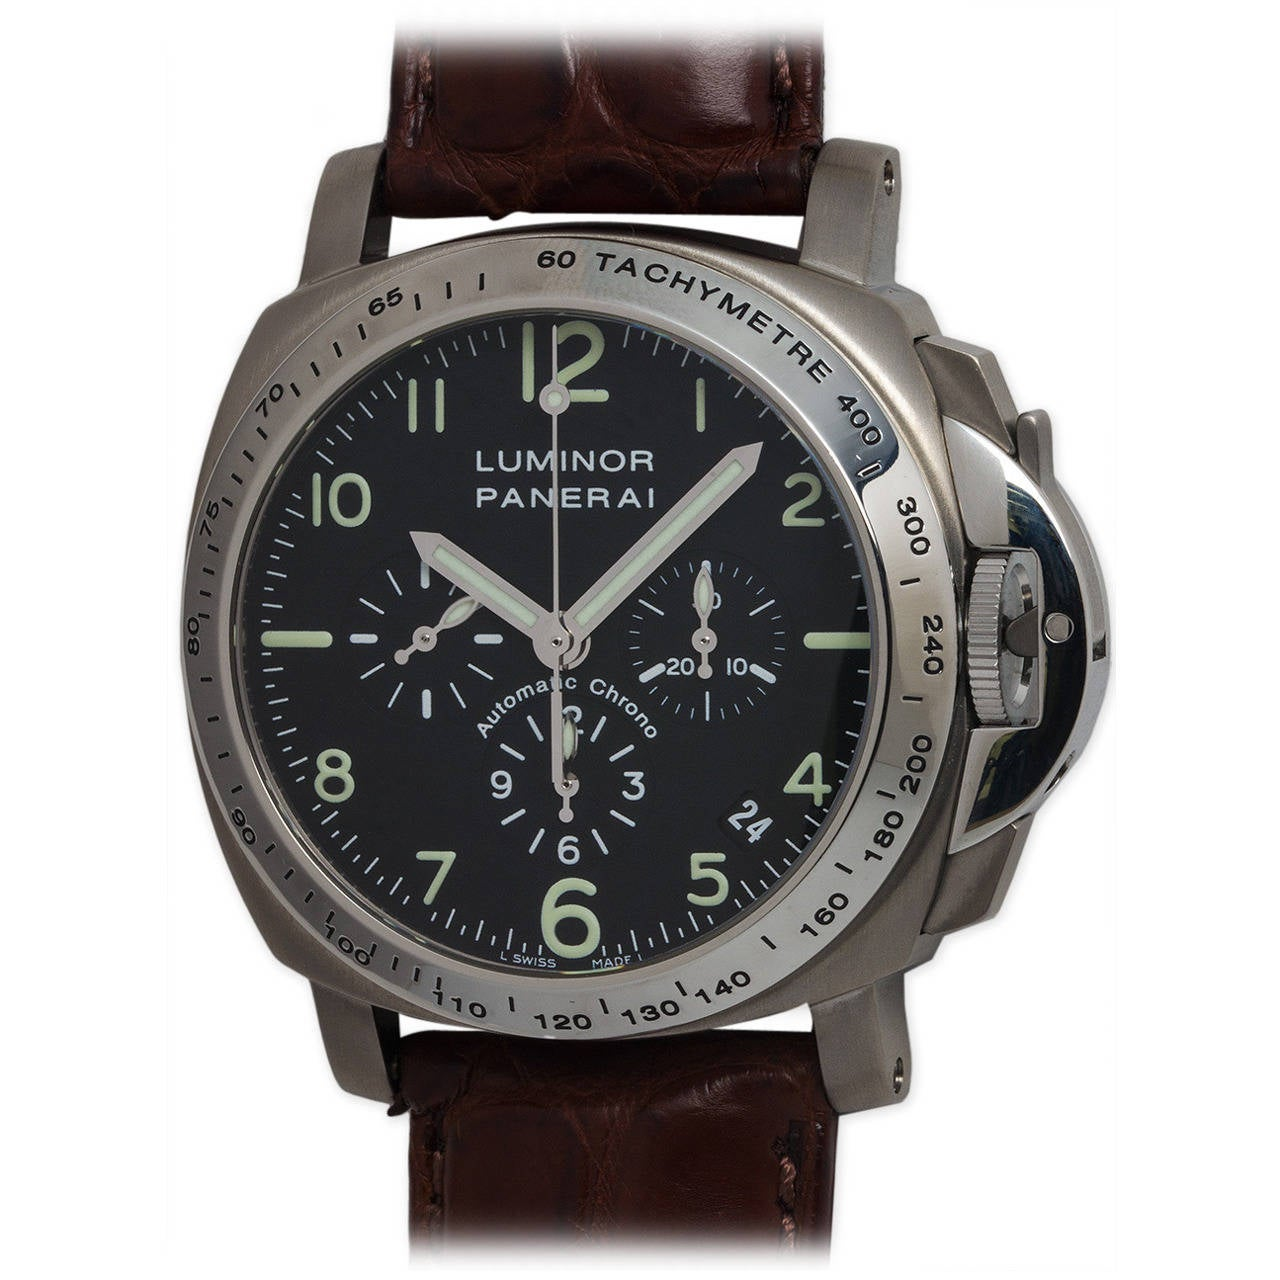 panerai titanium luminor chronograph wristwatch pam 74 at